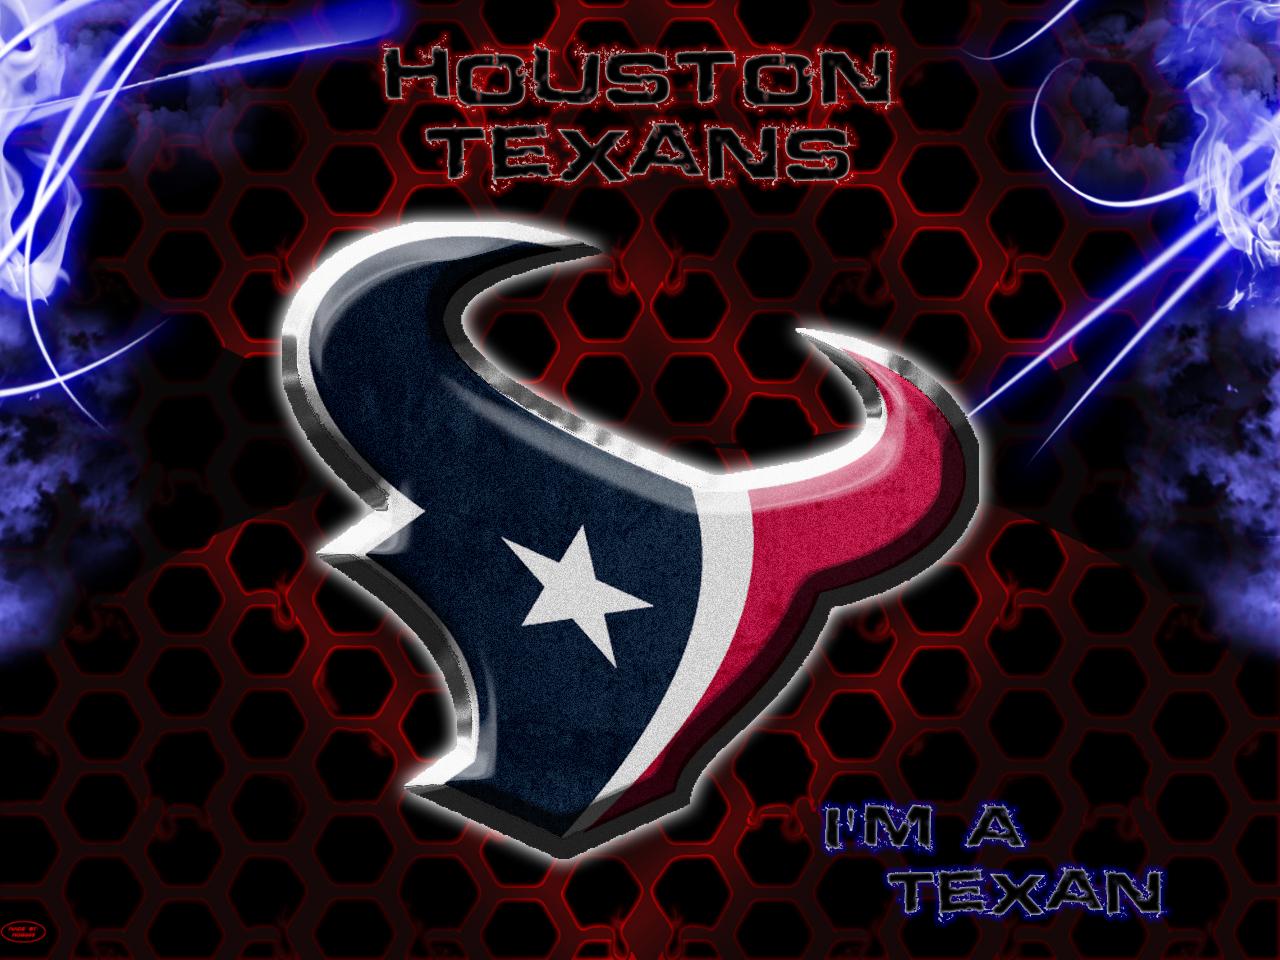 http://2.bp.blogspot.com/-vPkVIgx30bM/ULG-Sf31xaI/AAAAAAAAABA/1vDrzdMztBg/s1600/texans-wallpaper-im-a-texan.jpg